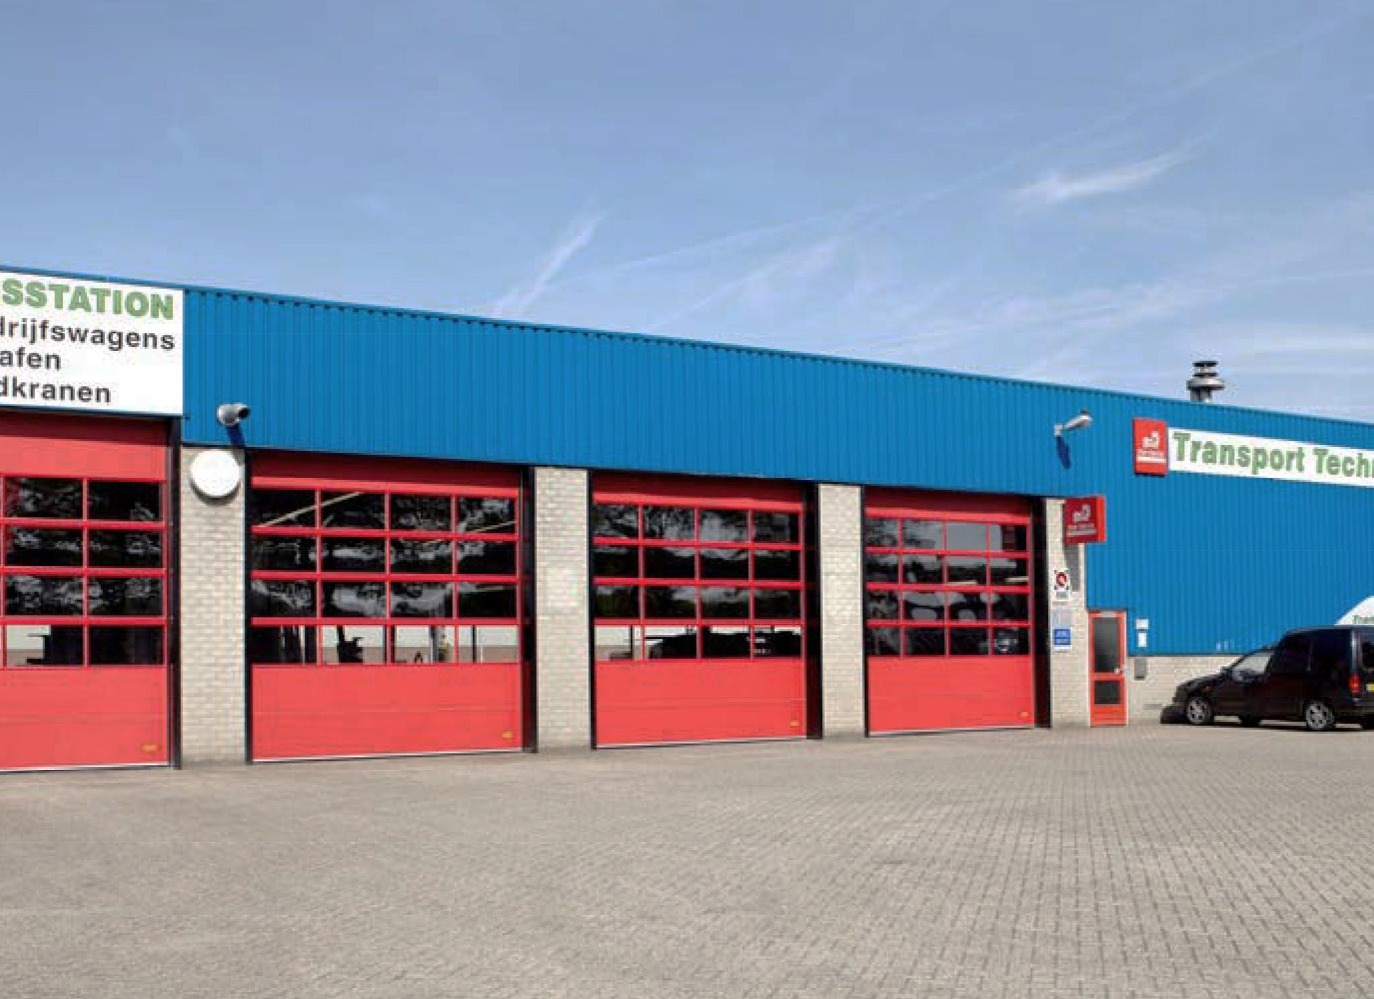 Industrial garage doors for a logistics company